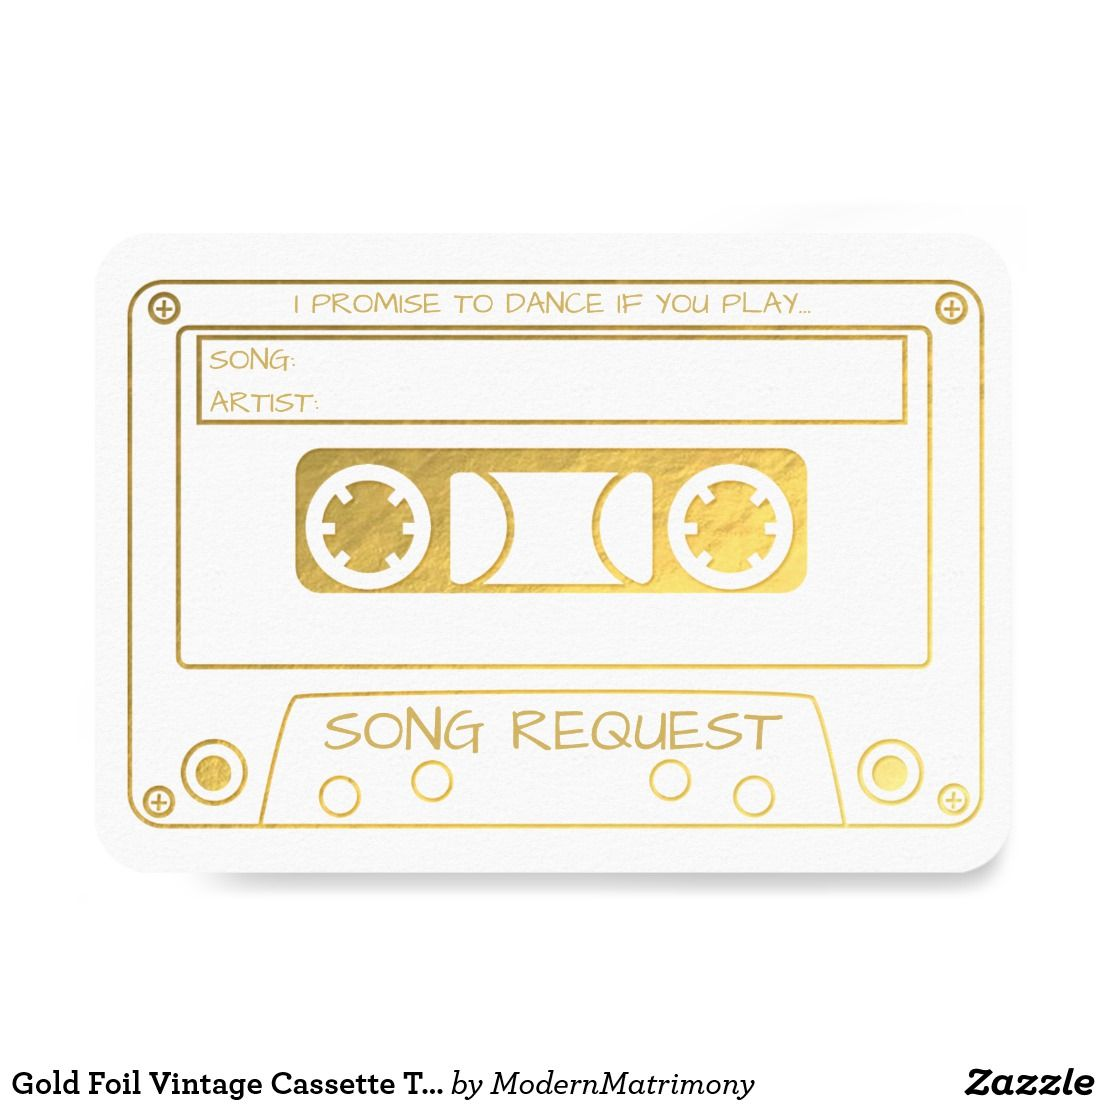 Gold Foil Vintage Cassette Tape Song Request Invitation Zazzle Com Song Request Gold Foil Wedding Invitations Foil Invitations